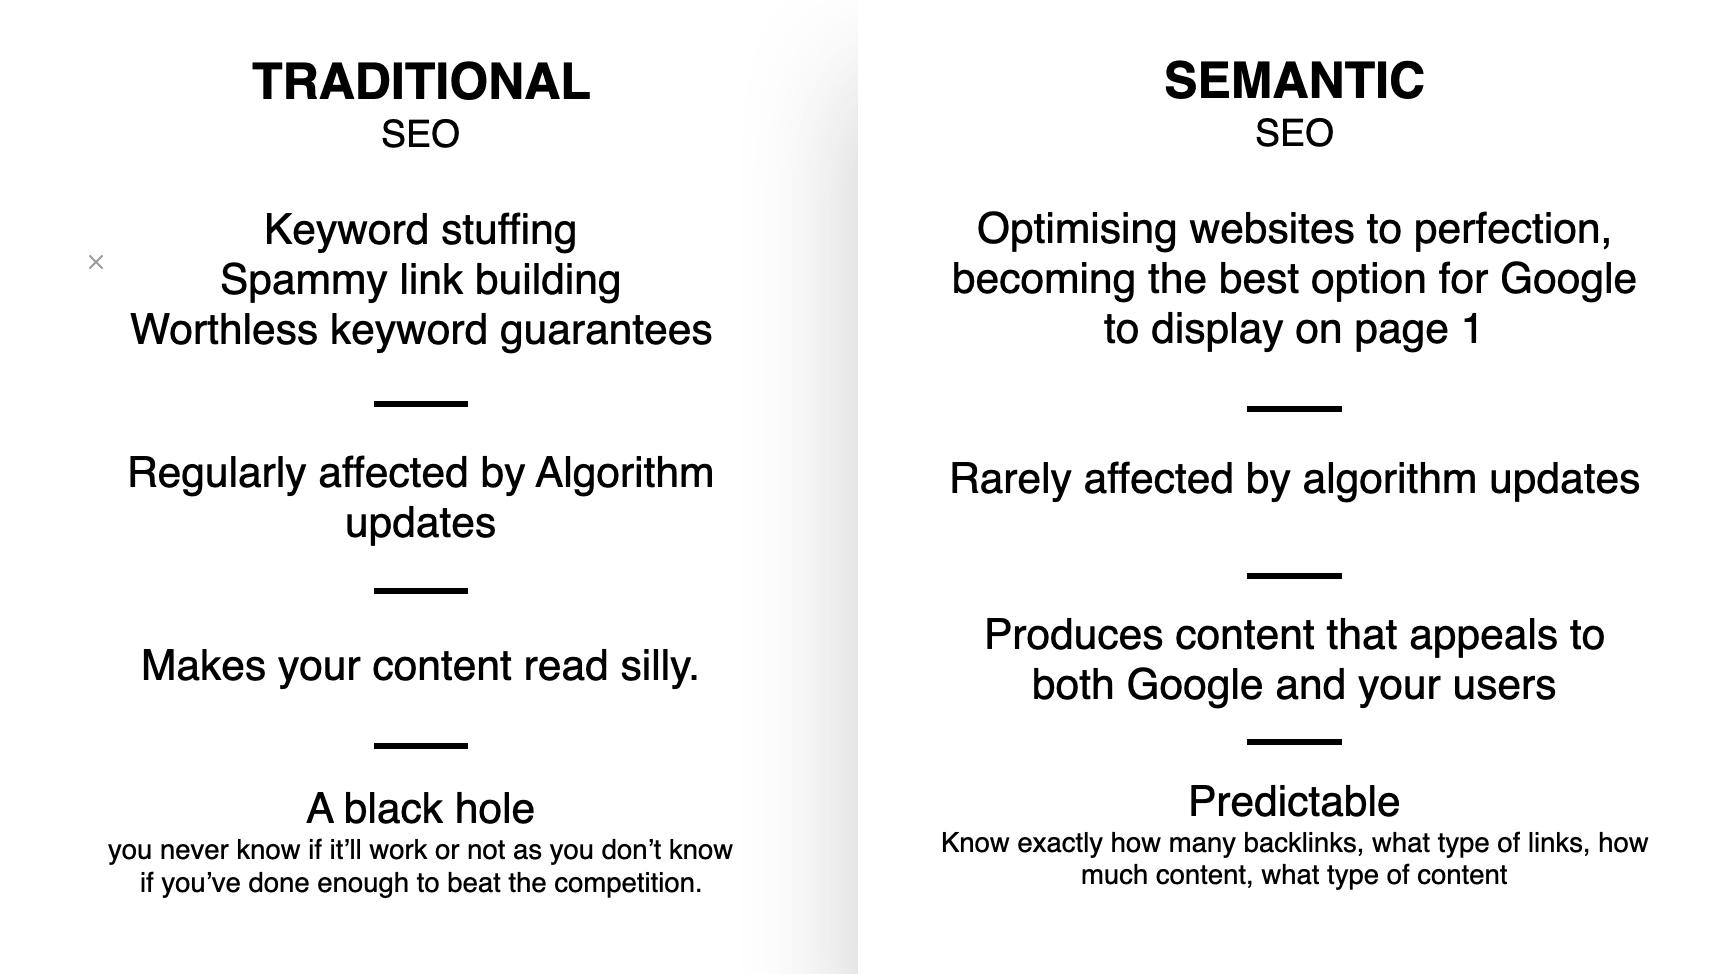 Semantic SEO vs Traditional SEO